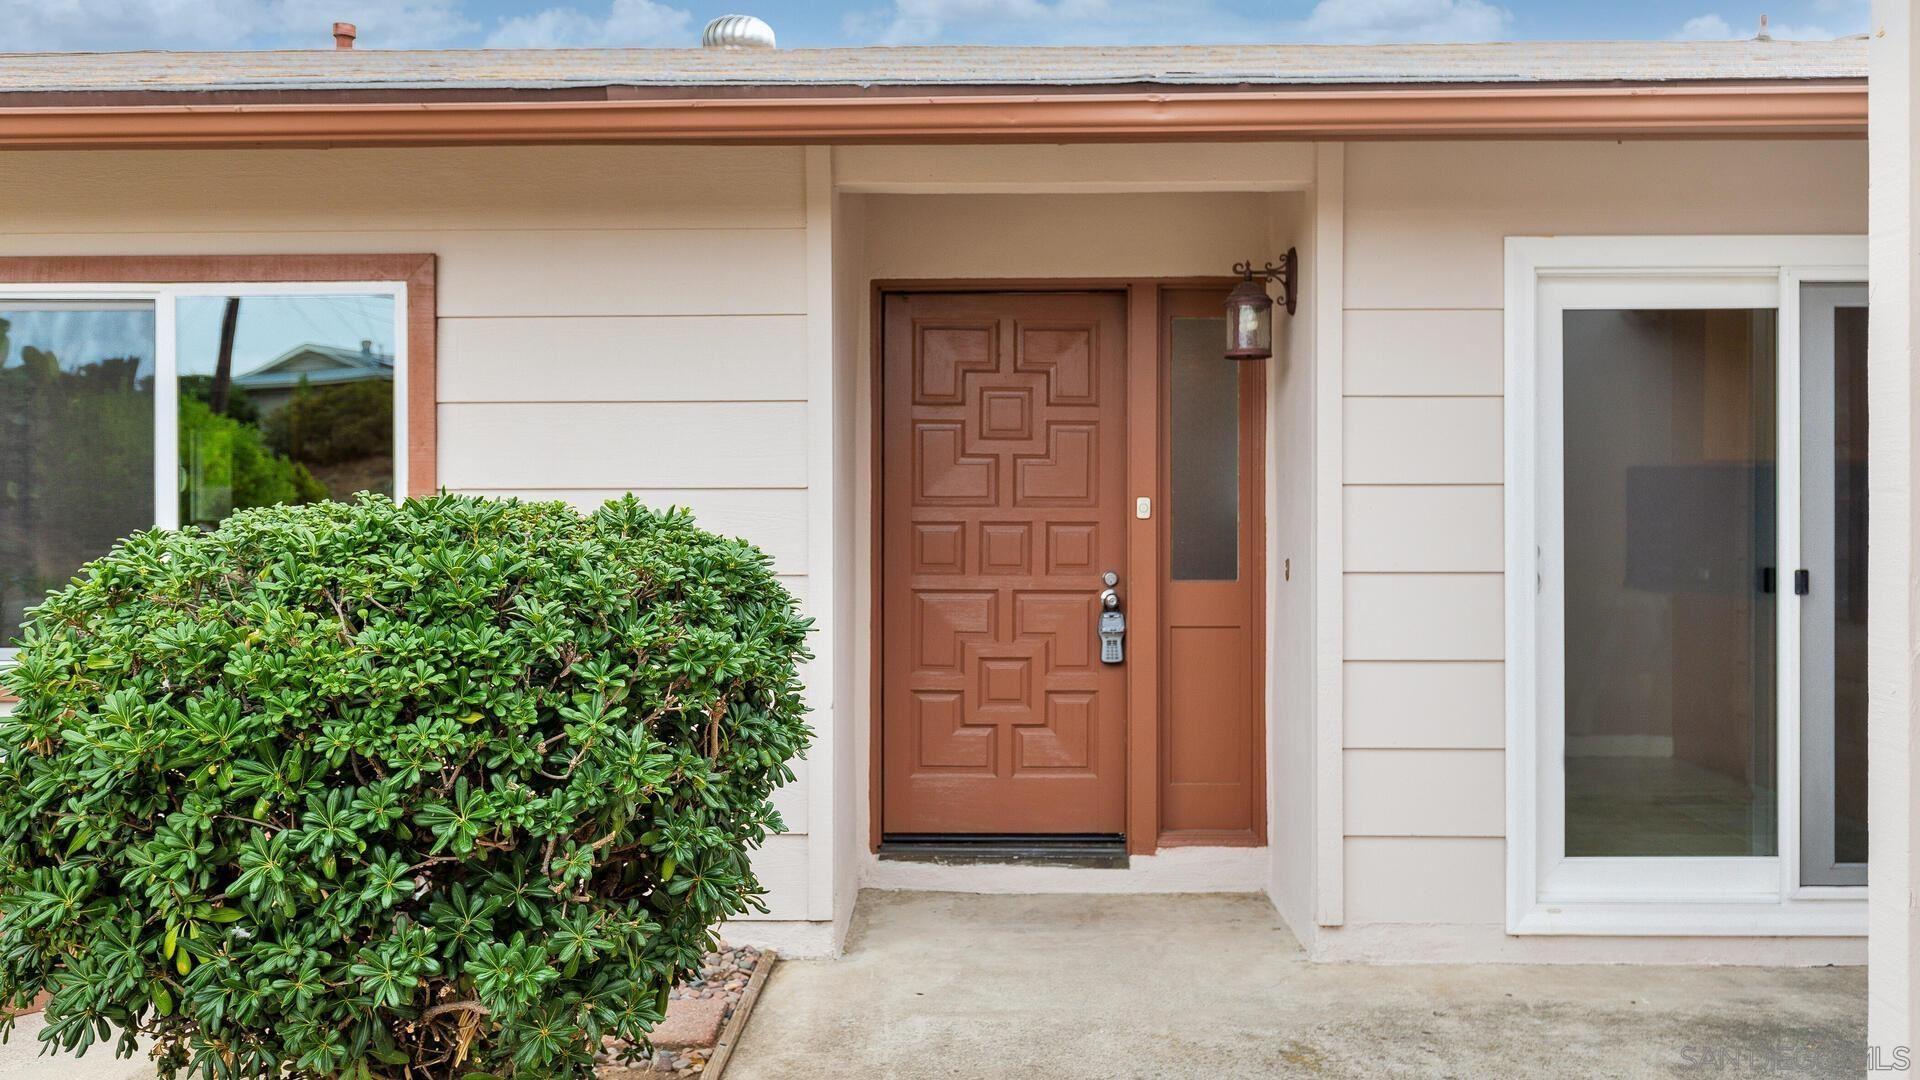 Photo of 13237 Ridgedale Dr, Poway, CA 92064 (MLS # 210028443)